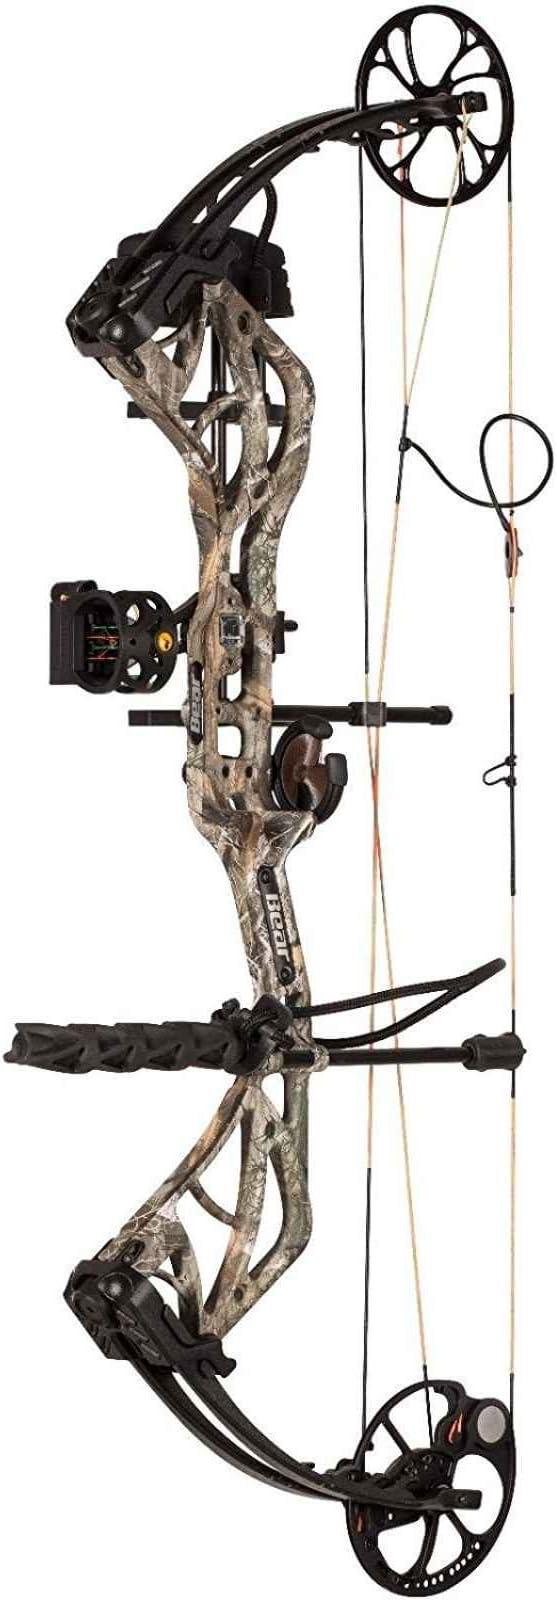 Bear Archery Species RTH